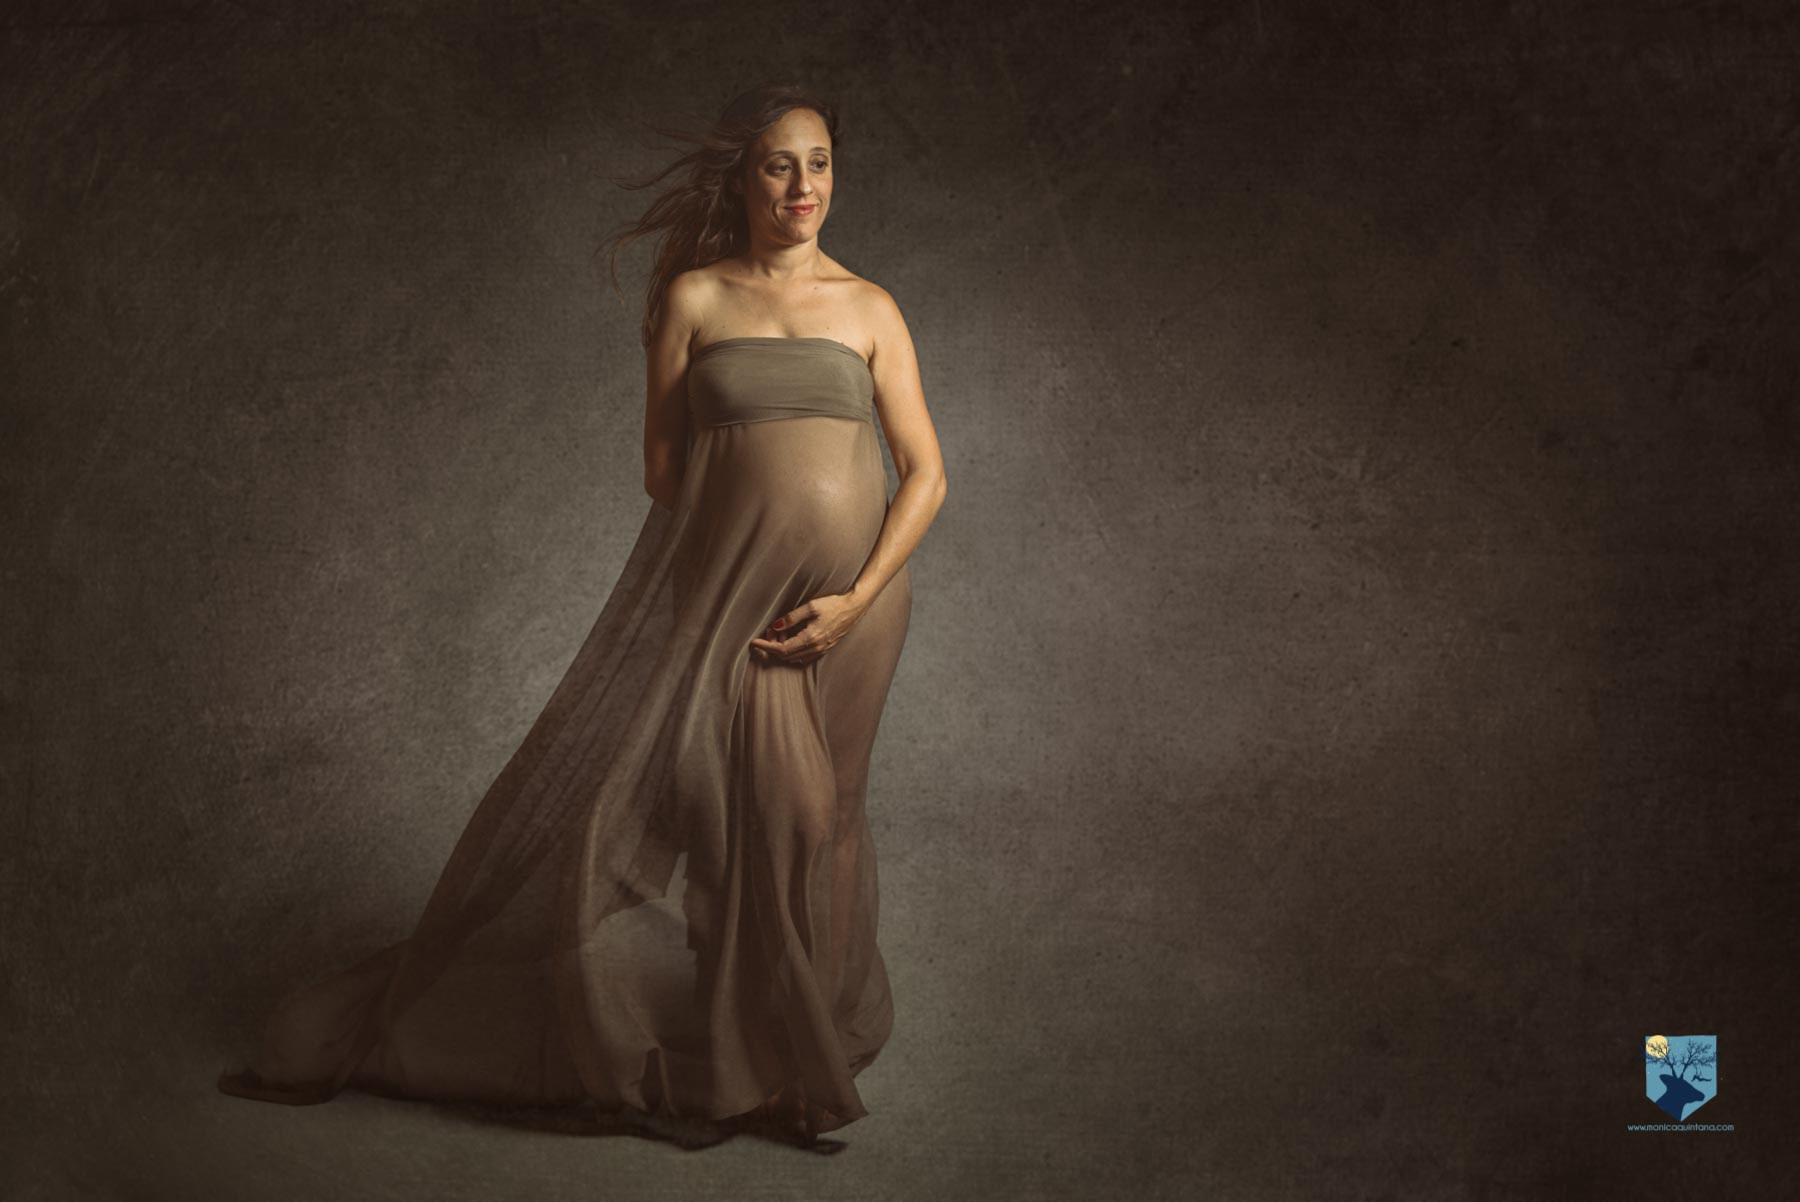 fotografia, girona, figueres, emporda, monica quintana, familia, retrato, embarazo, estudio